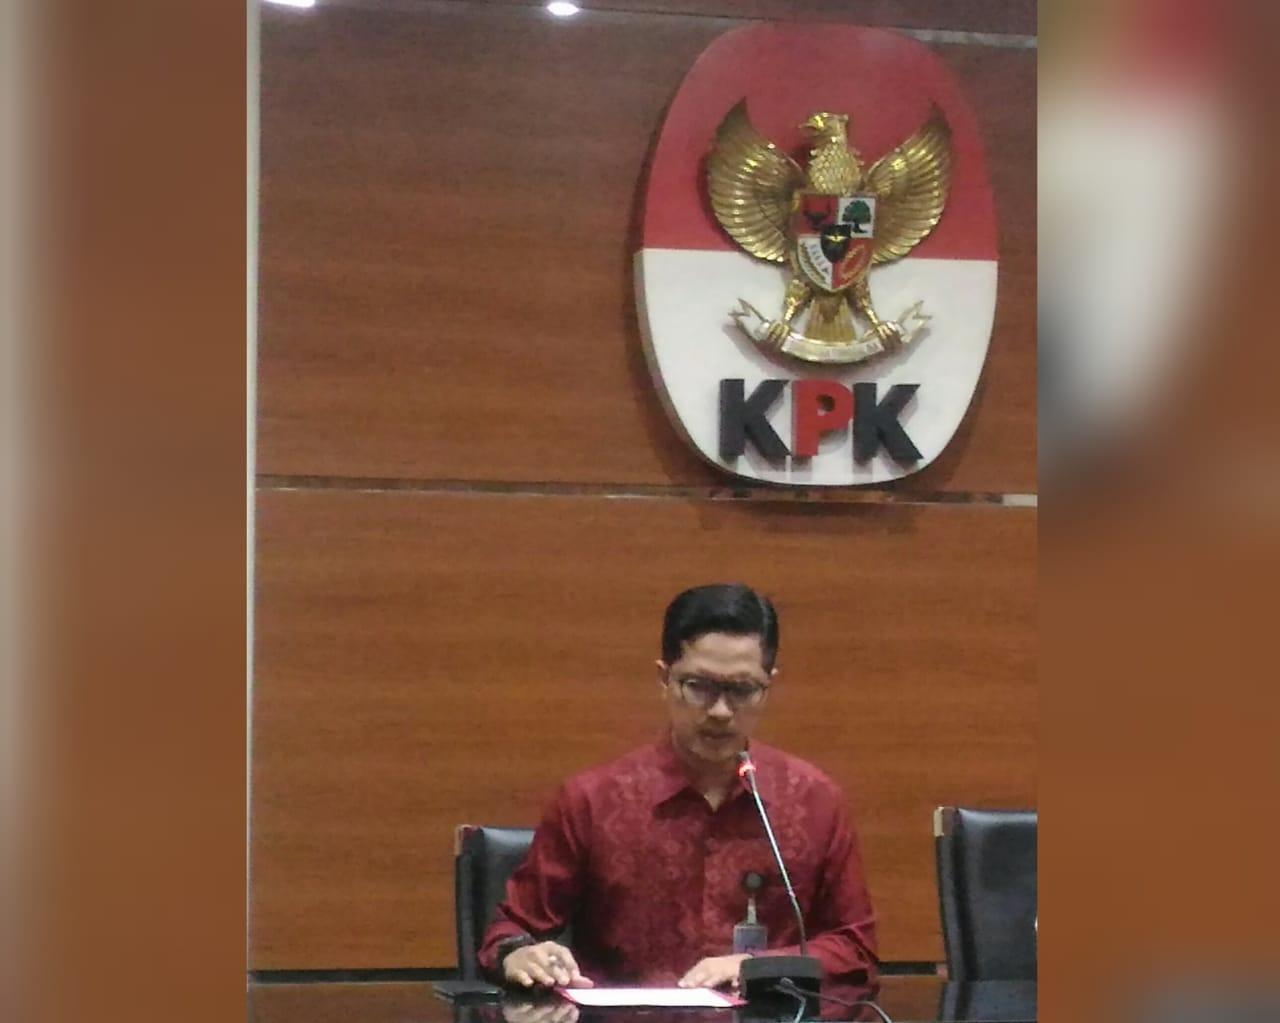 OTT KPK Berhasil Tangkap Bupati Kabupaten Pakpak Bharat